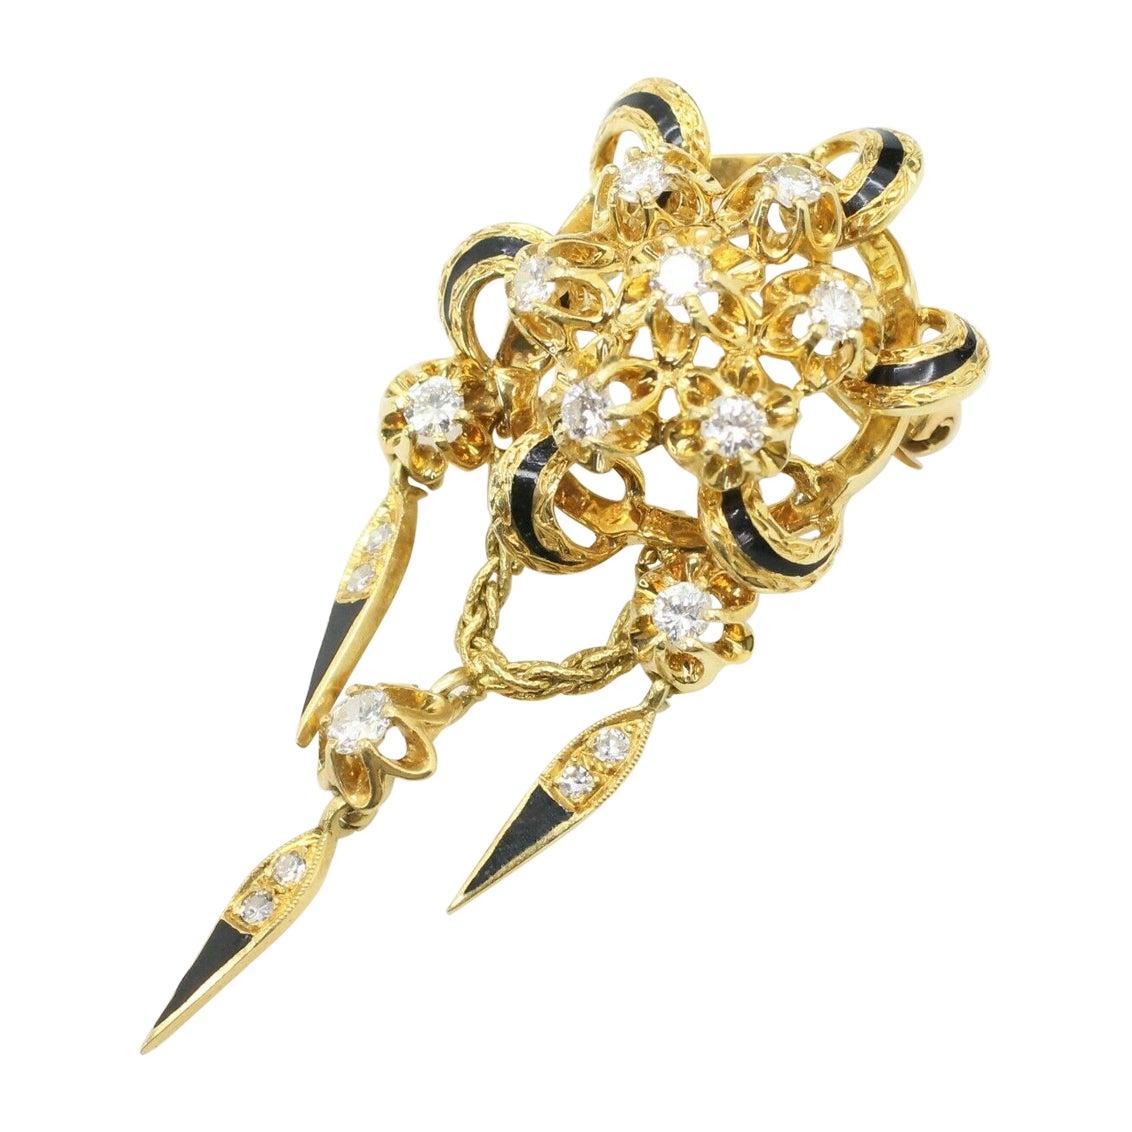 18k Yellow Gold Diamond Brooch with Enamel